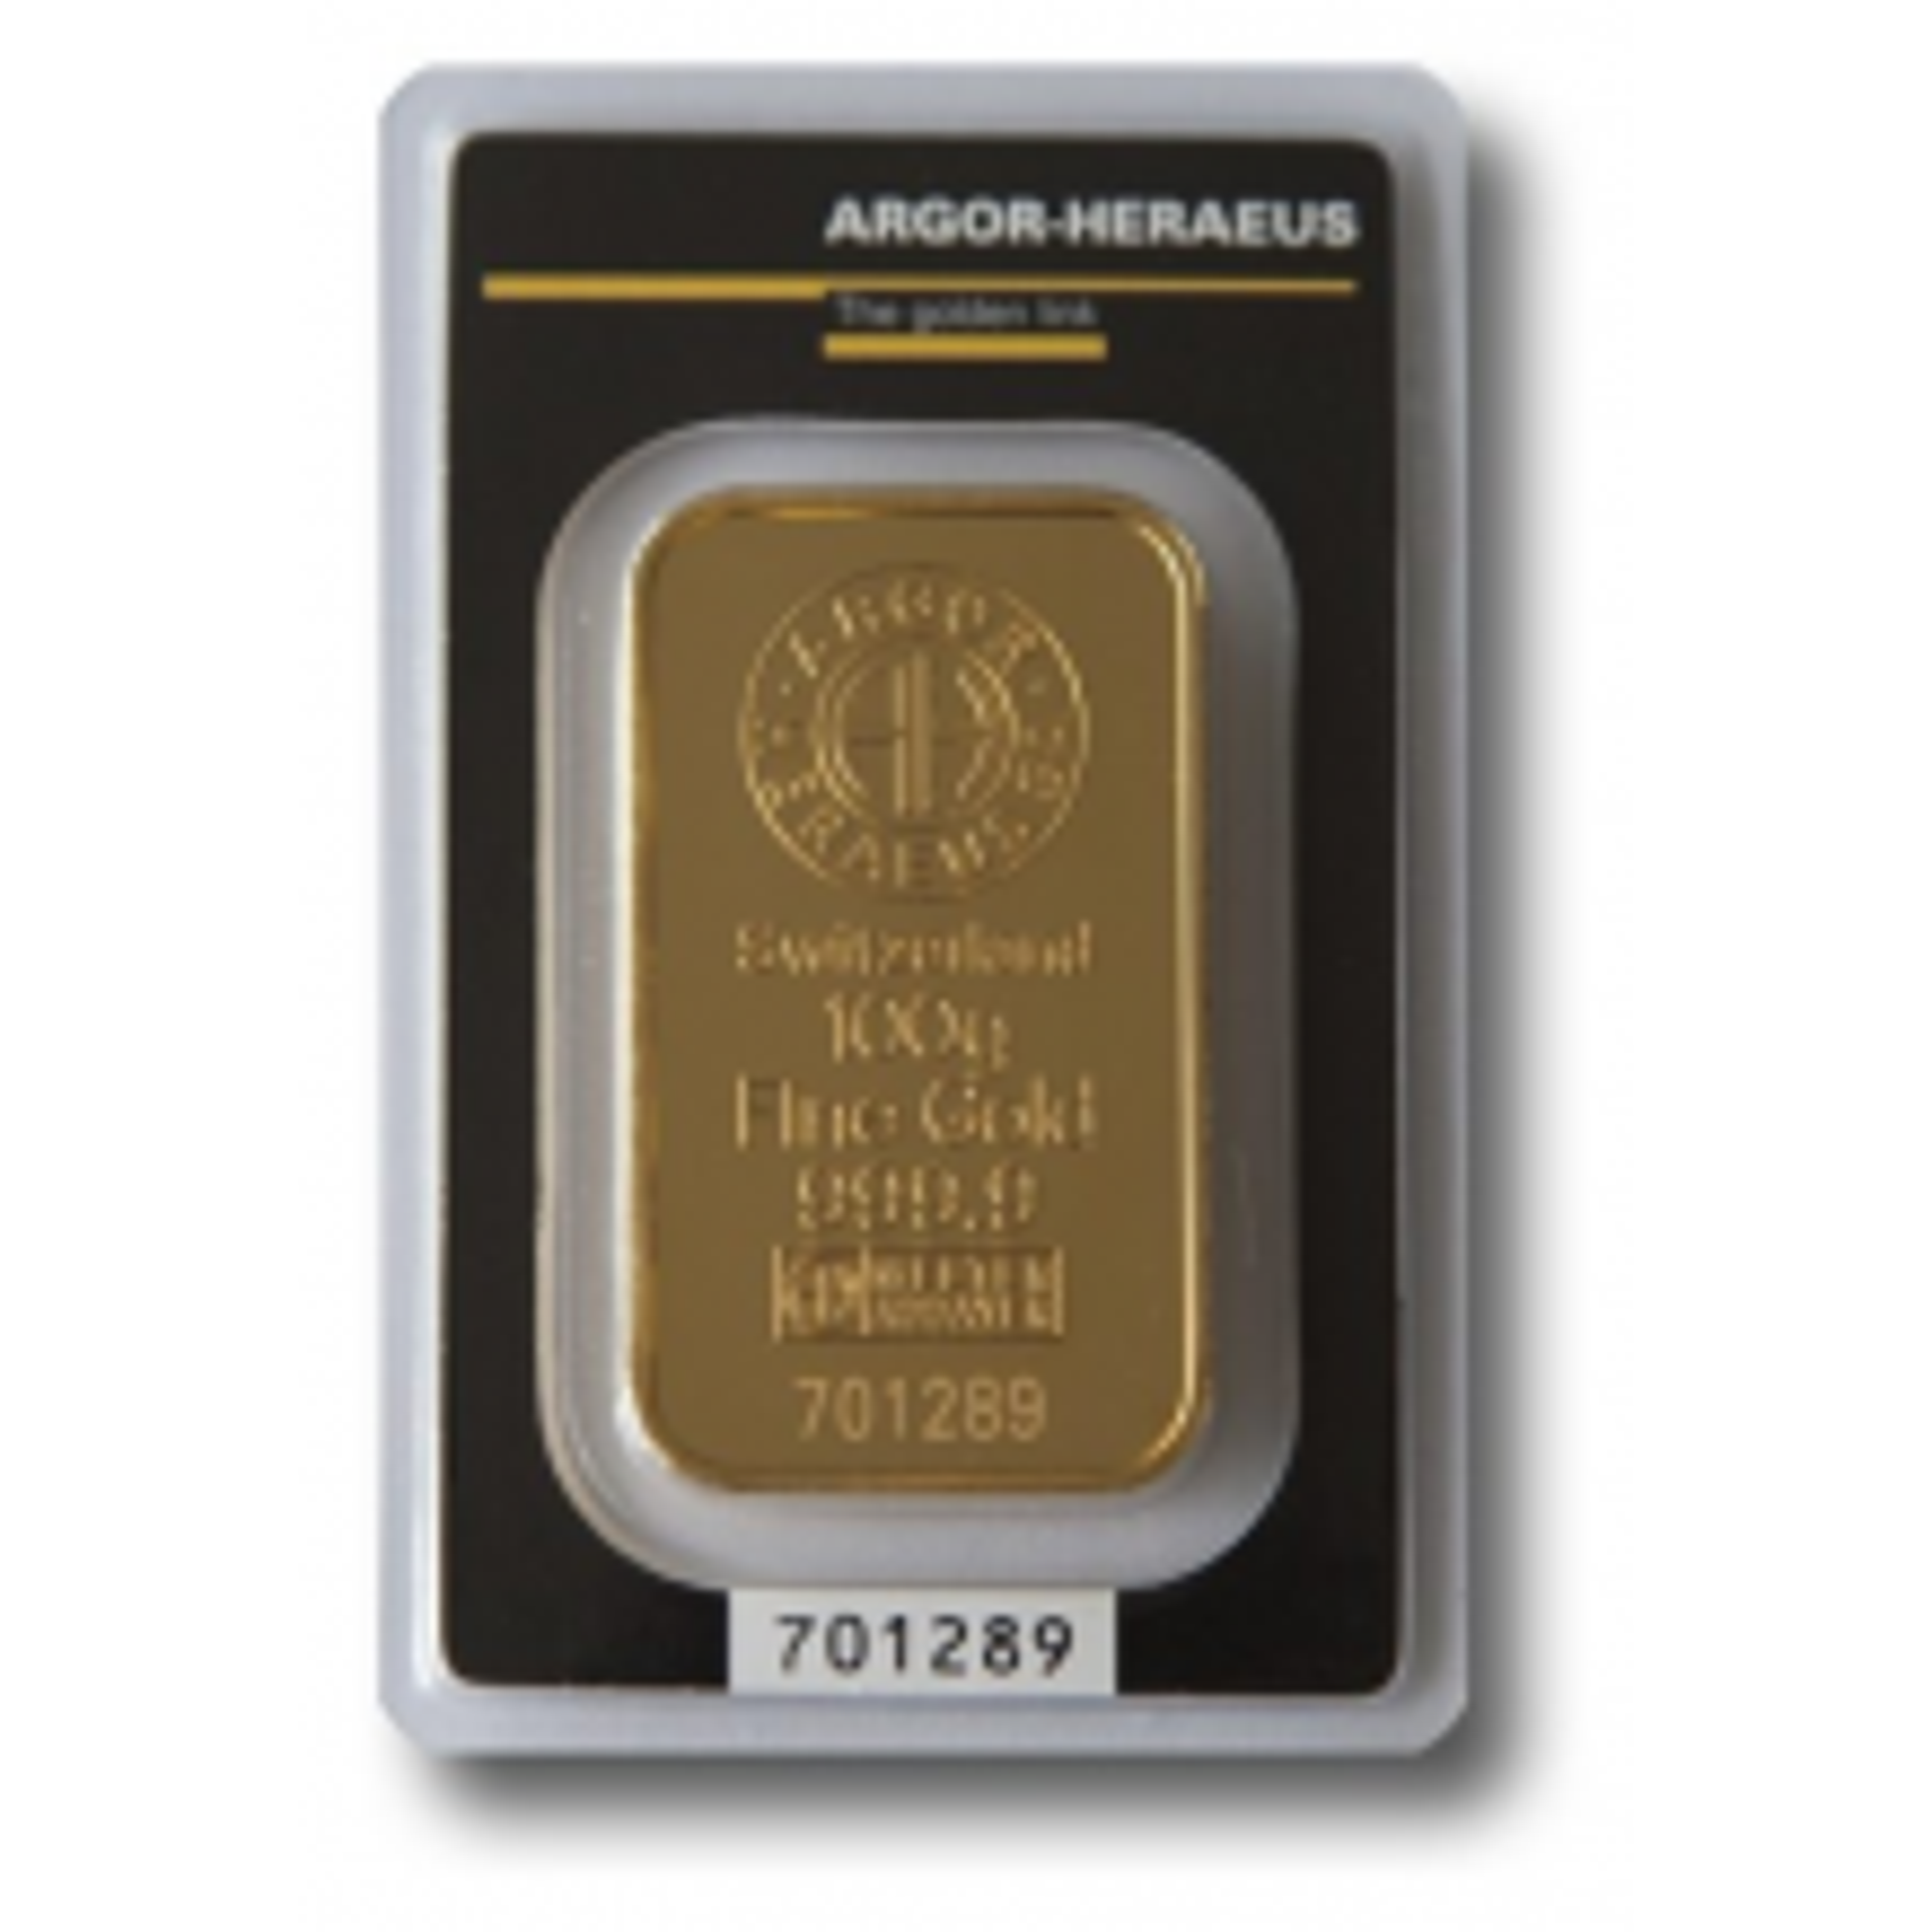 Argor Heraeus goudbaar 100 gram goud